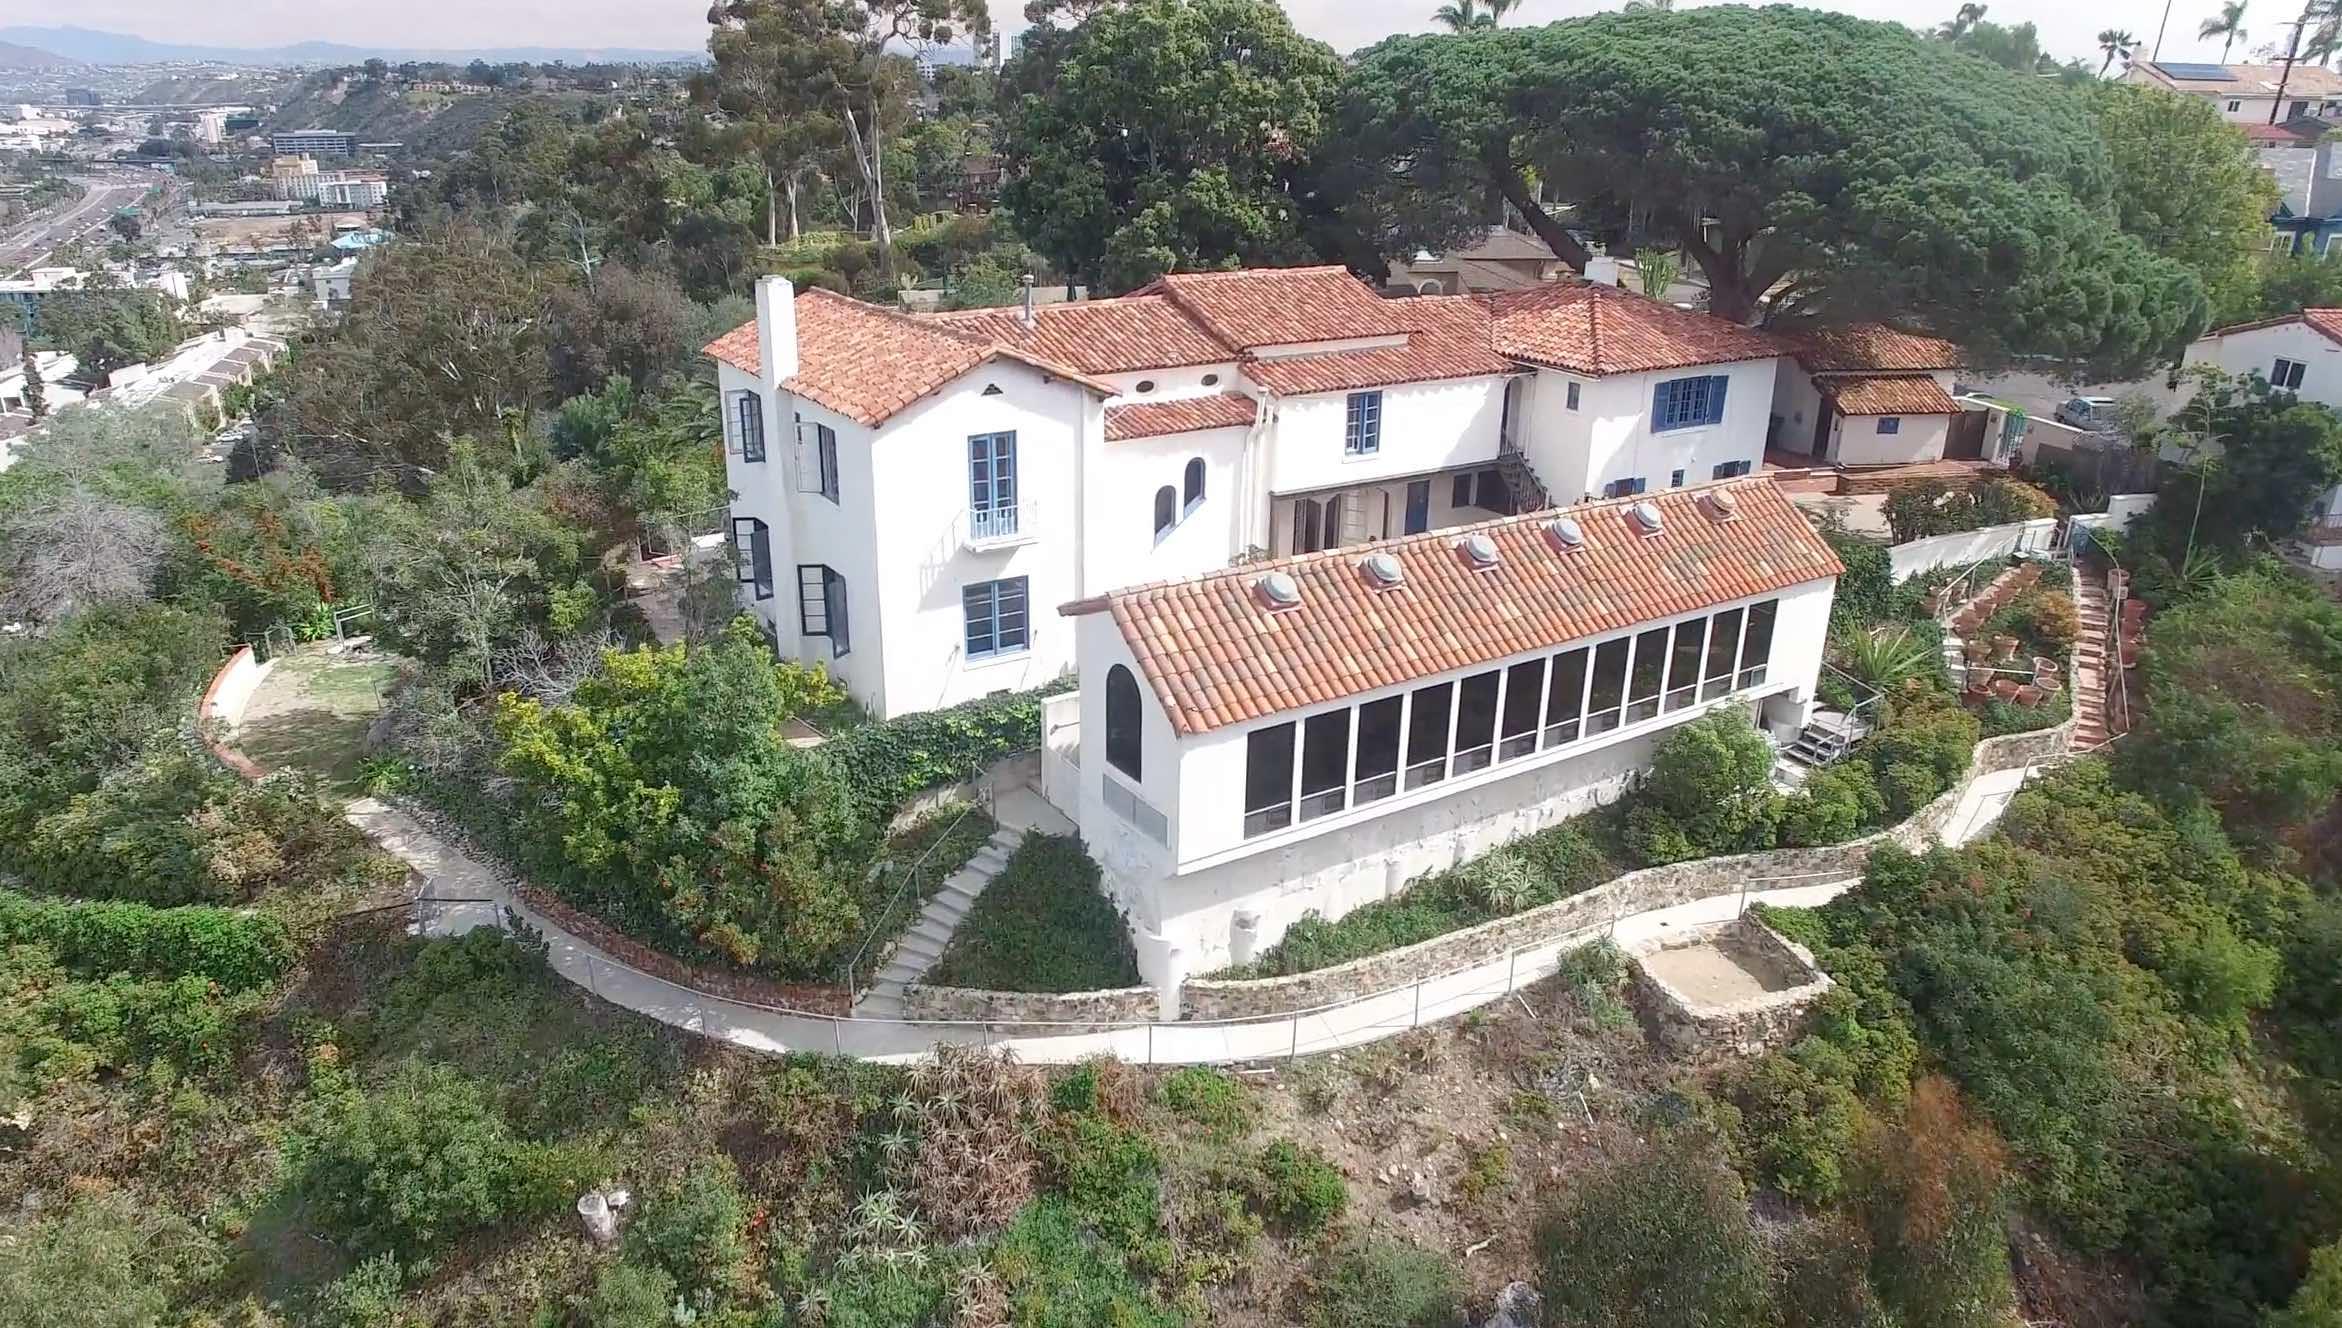 Villa-Hermosa-Aerial-3